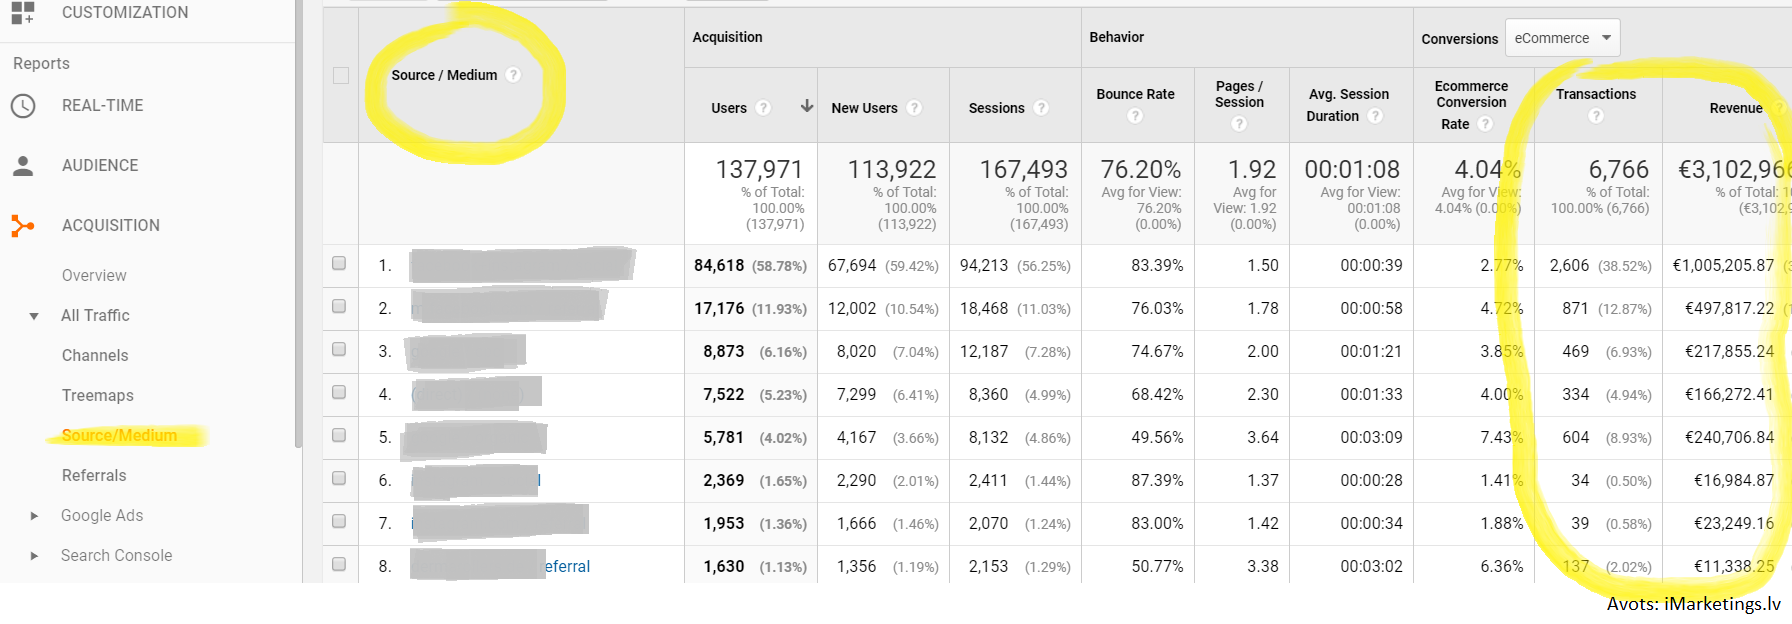 Google-Analytics-source-medium-report-last-click-attribution-imarketings